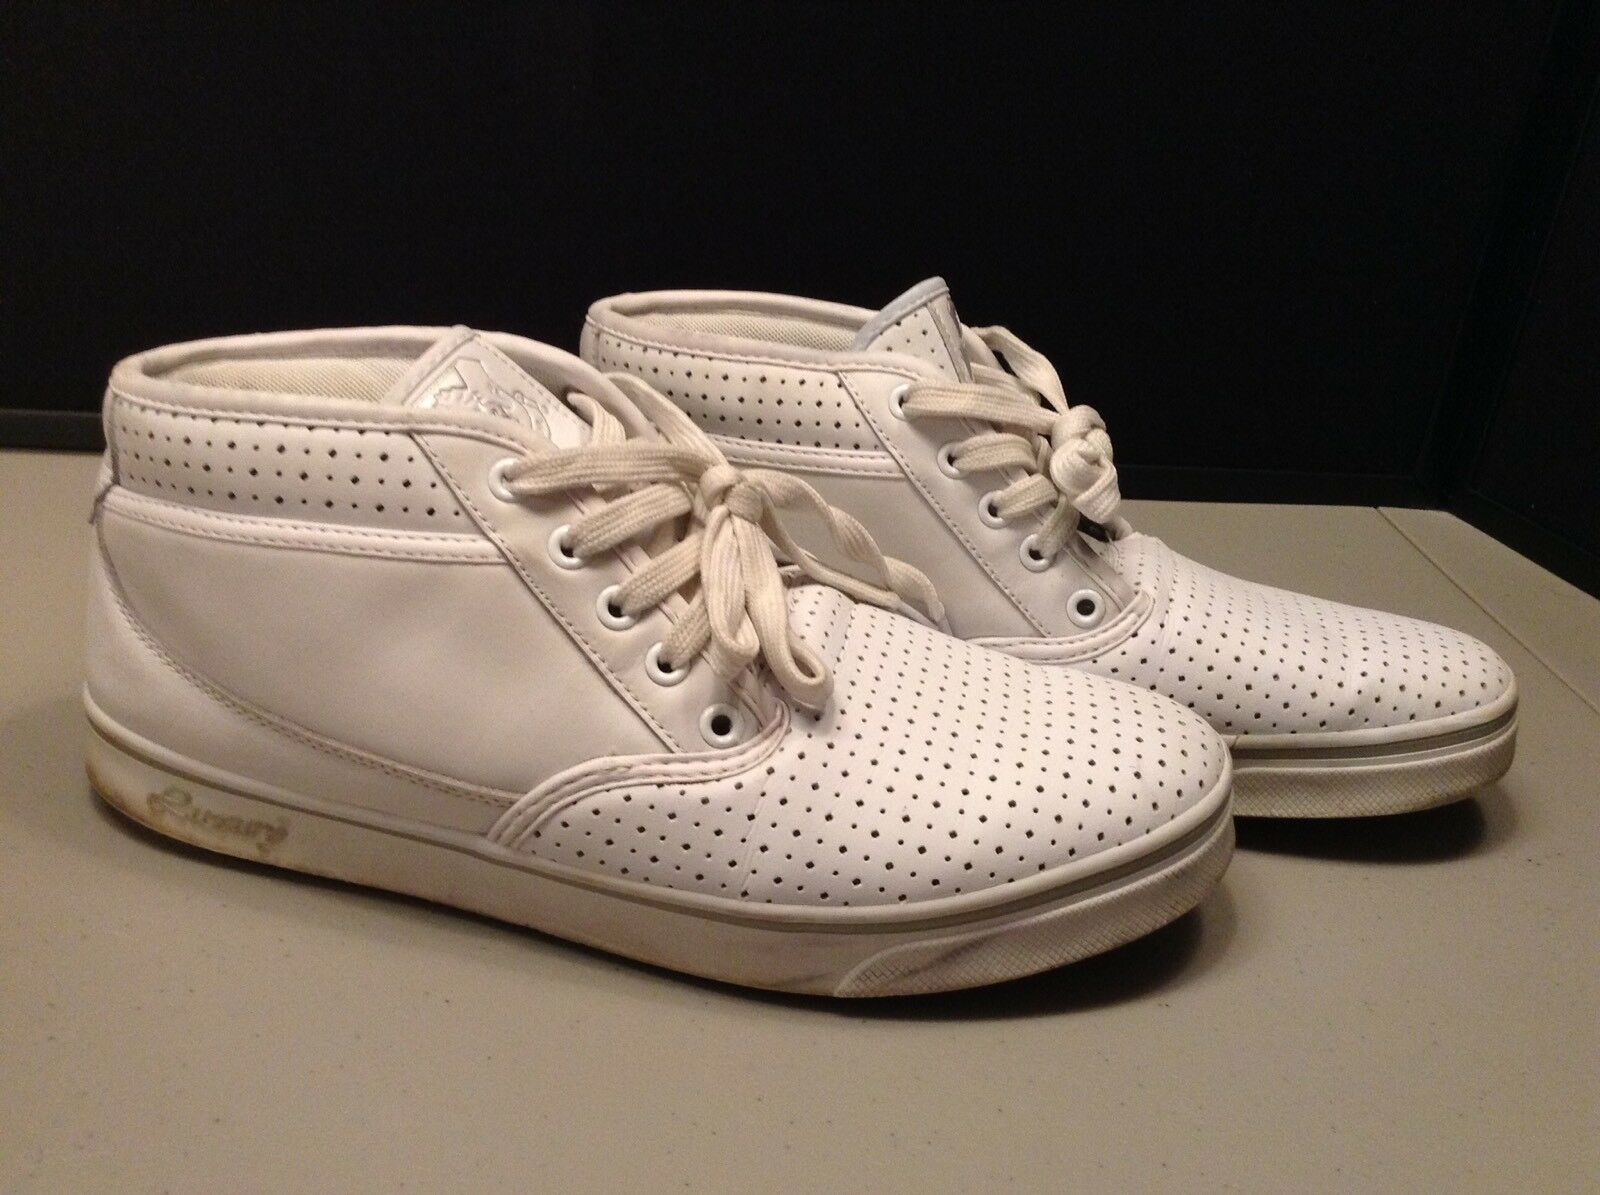 Mens Vlado Footwear Luxury Size 10 White Hightop shoes